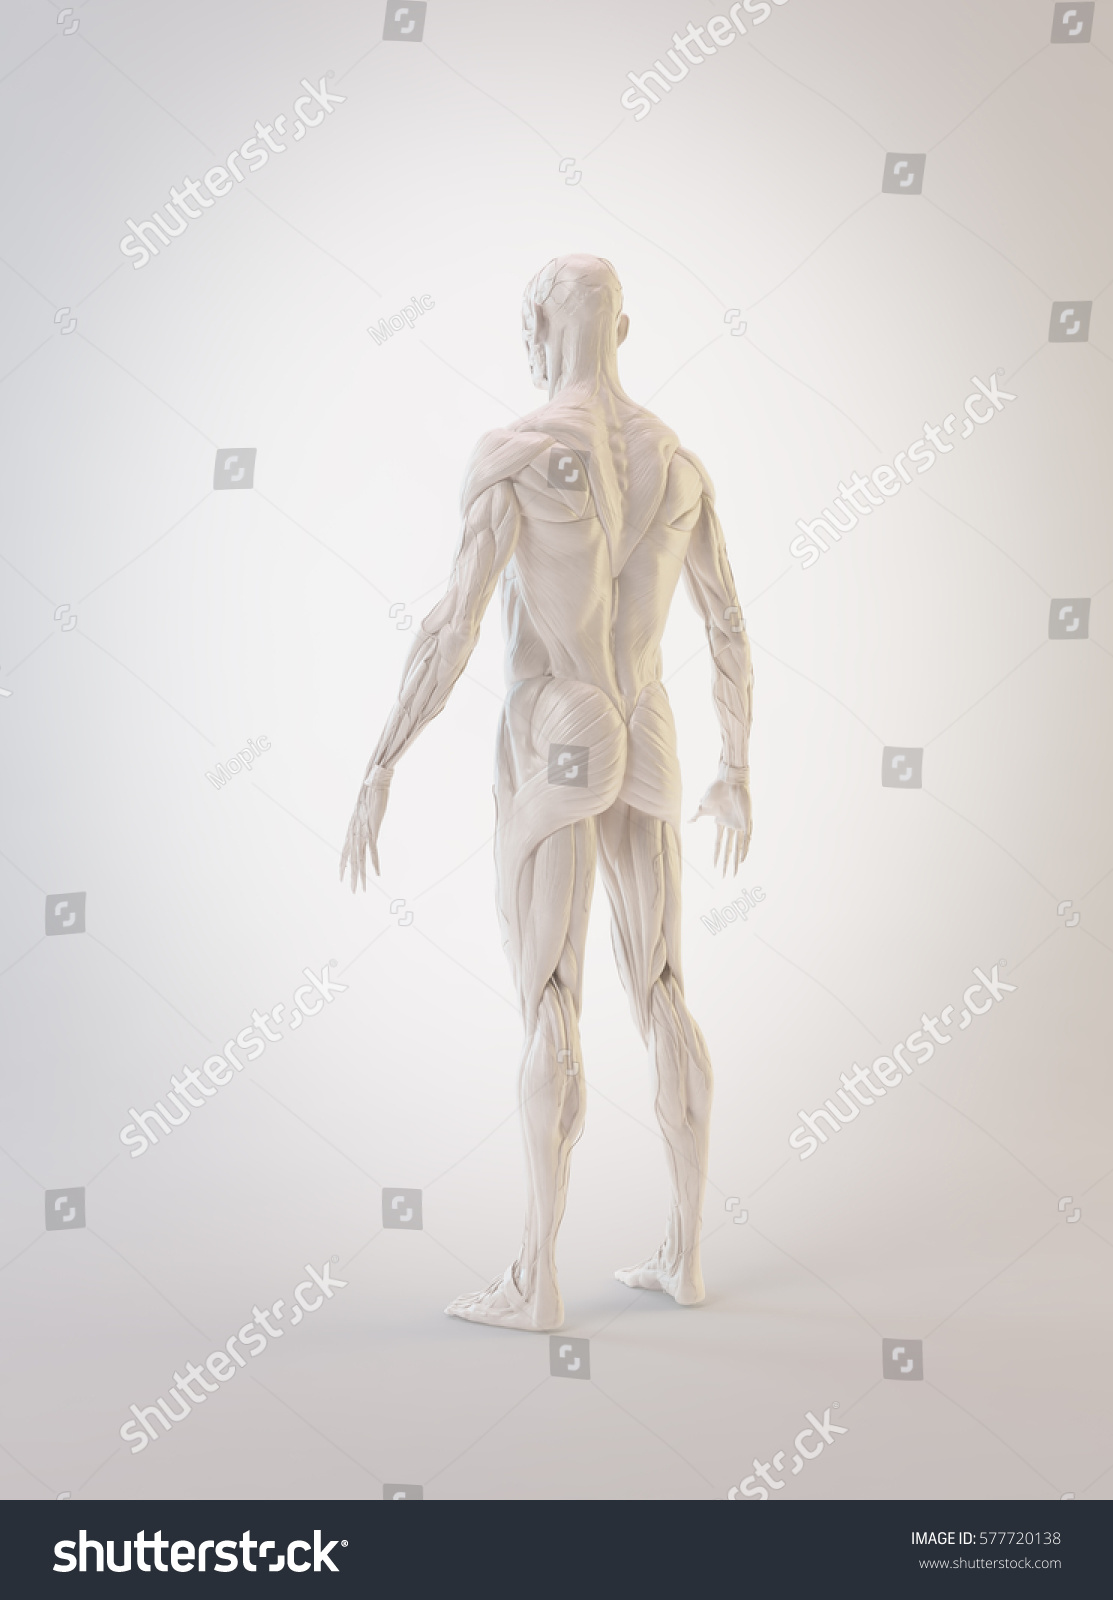 Detailed Muscle Human Anatomy 3 D Illustration Stock Illustration